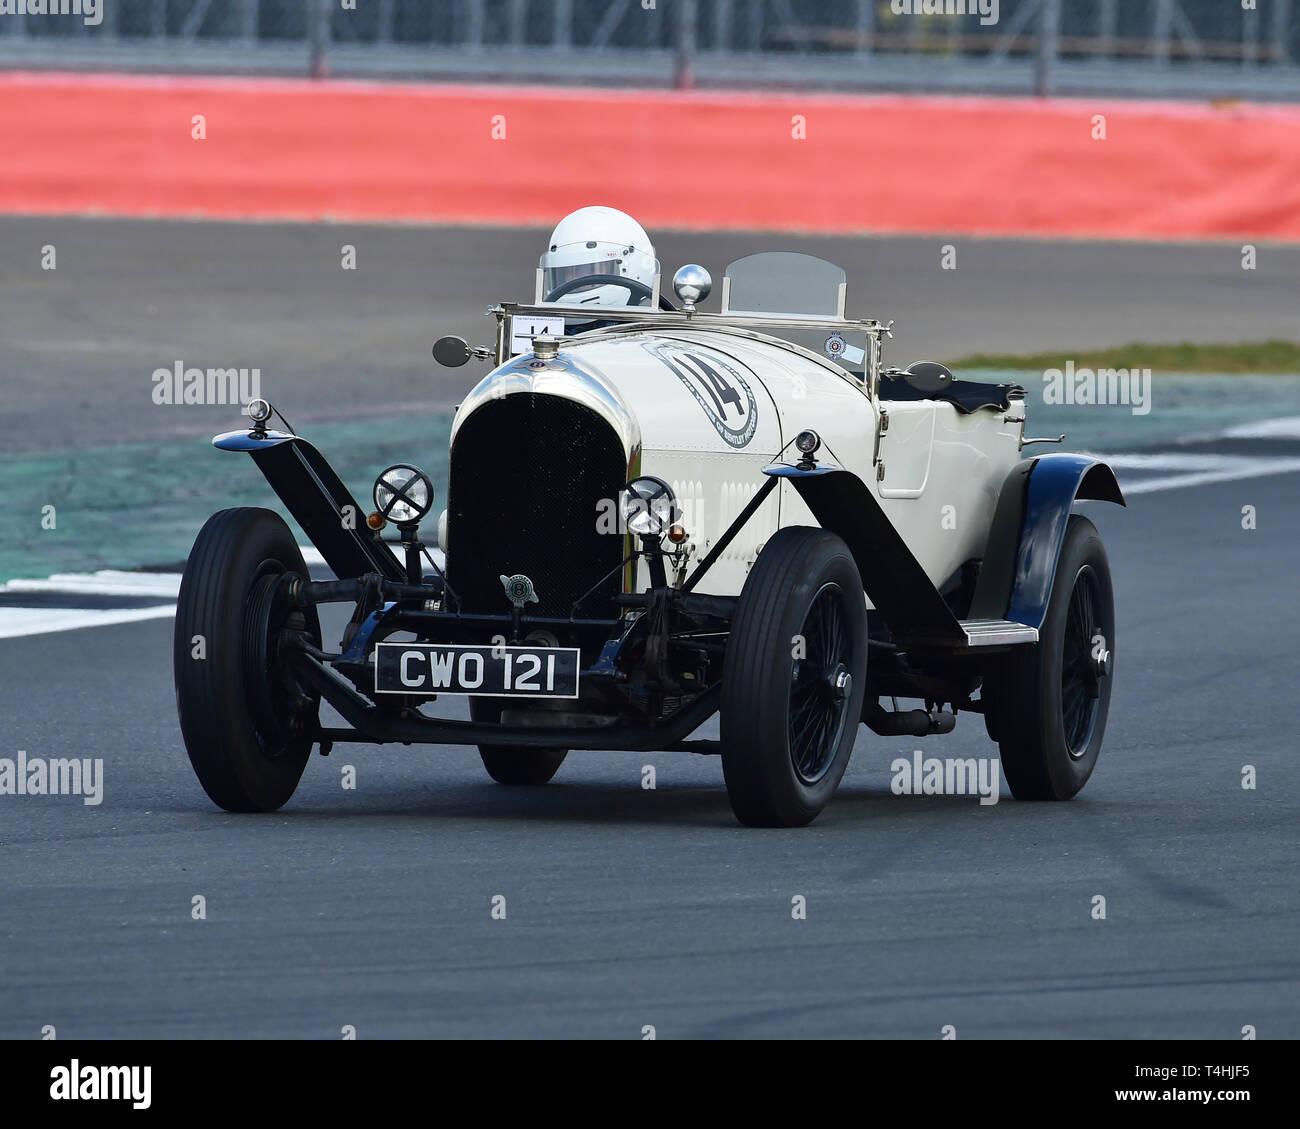 Vivian Bush, Jock MacKinnon, Bentley 3 litre Speed Model, Benjafield 100, 100 Years of Bentley, April 2019,  Silverstone, Northamptonshire, England, c - Stock Image